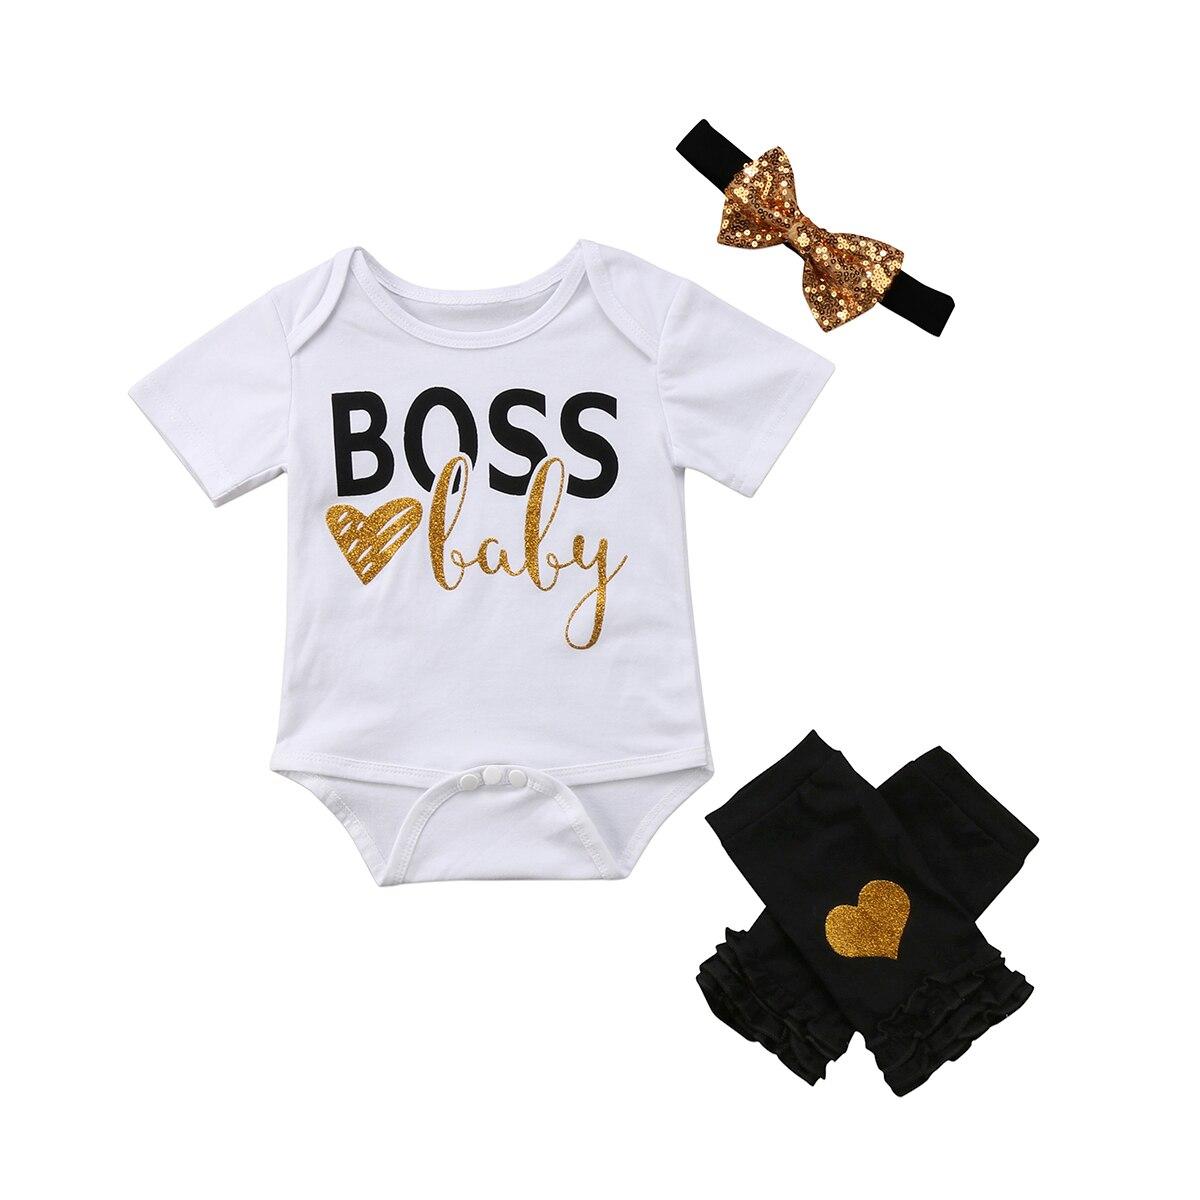 Fashion 3Pcs Newborn Baby Girls O-neck Short Sleeve Rompe Casual Jumpsuit + Pants Leggings Headband Outfits Set Costume